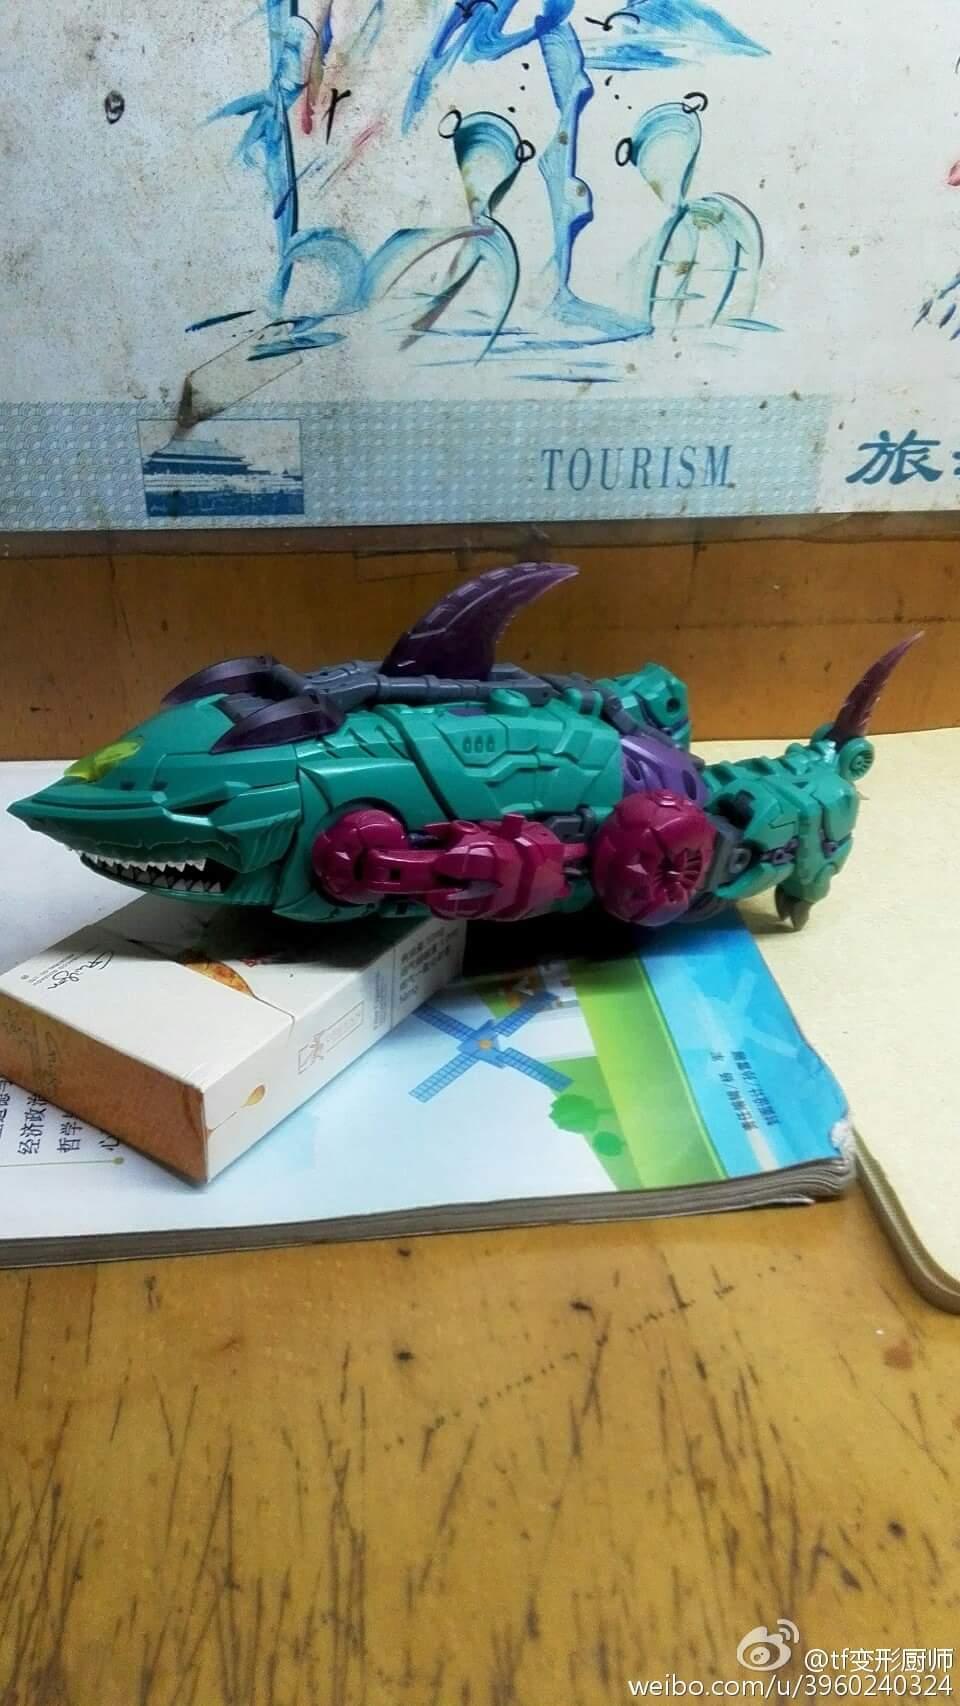 [TFC Toys] Produit Tiers - Jouet Poseidon - aka Piranacon/King Poseidon (TF Masterforce) - Page 3 Q9MPAvEA